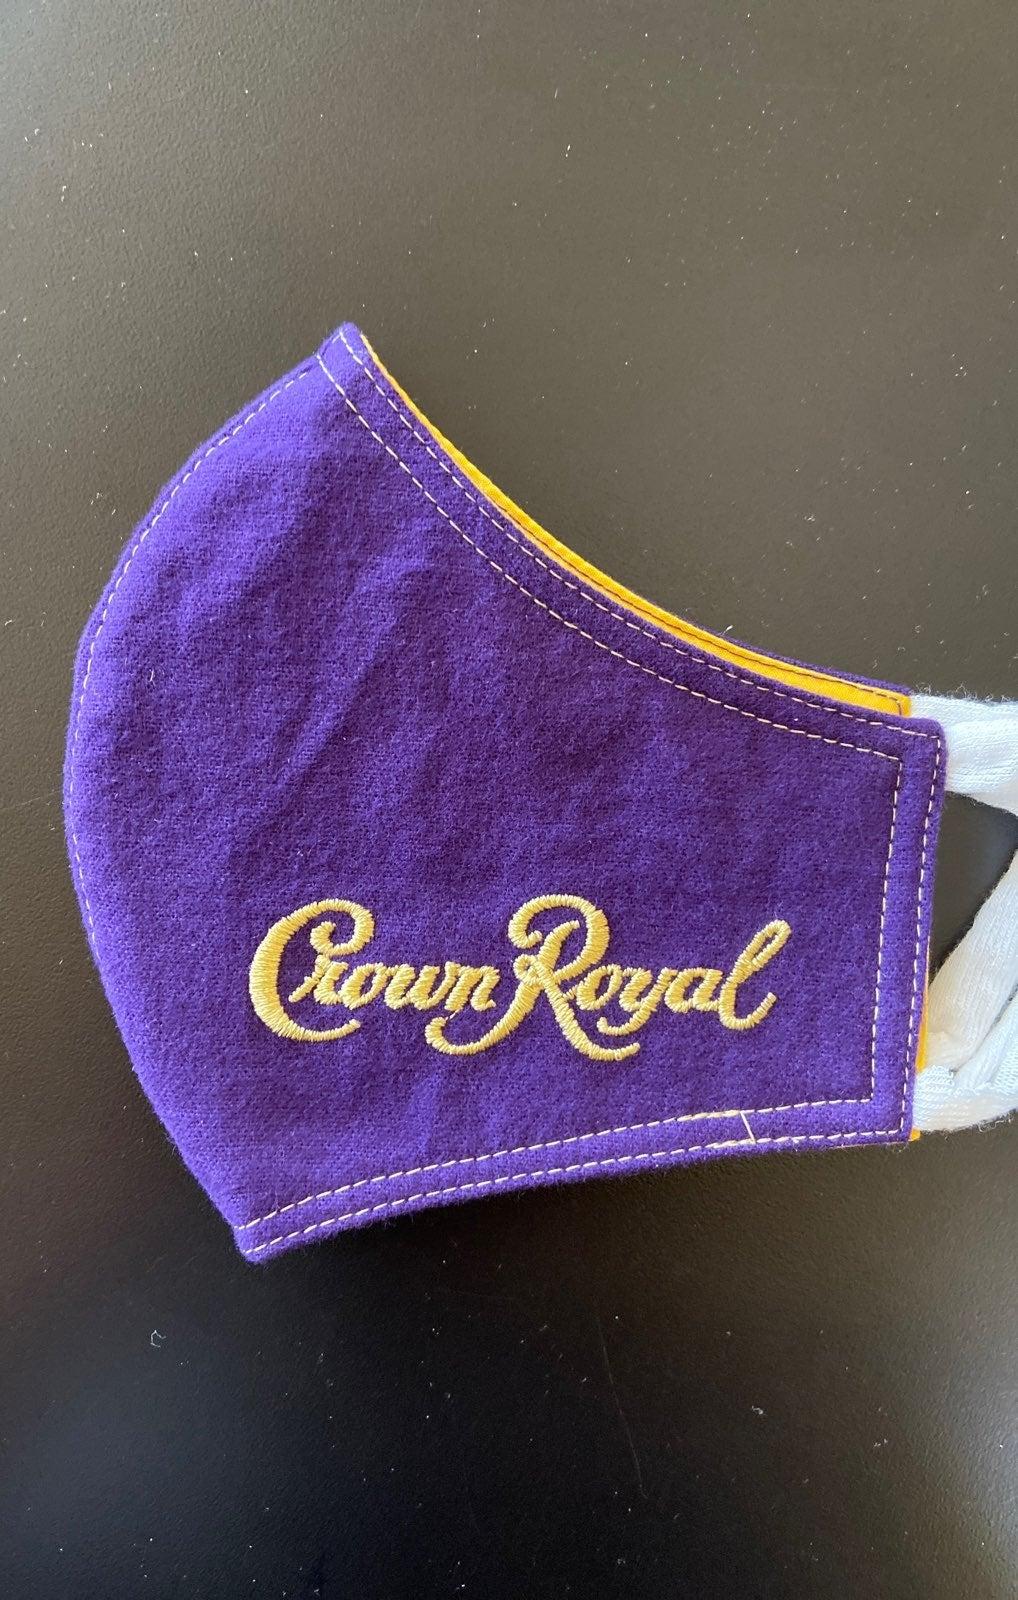 Crown Royal face mask